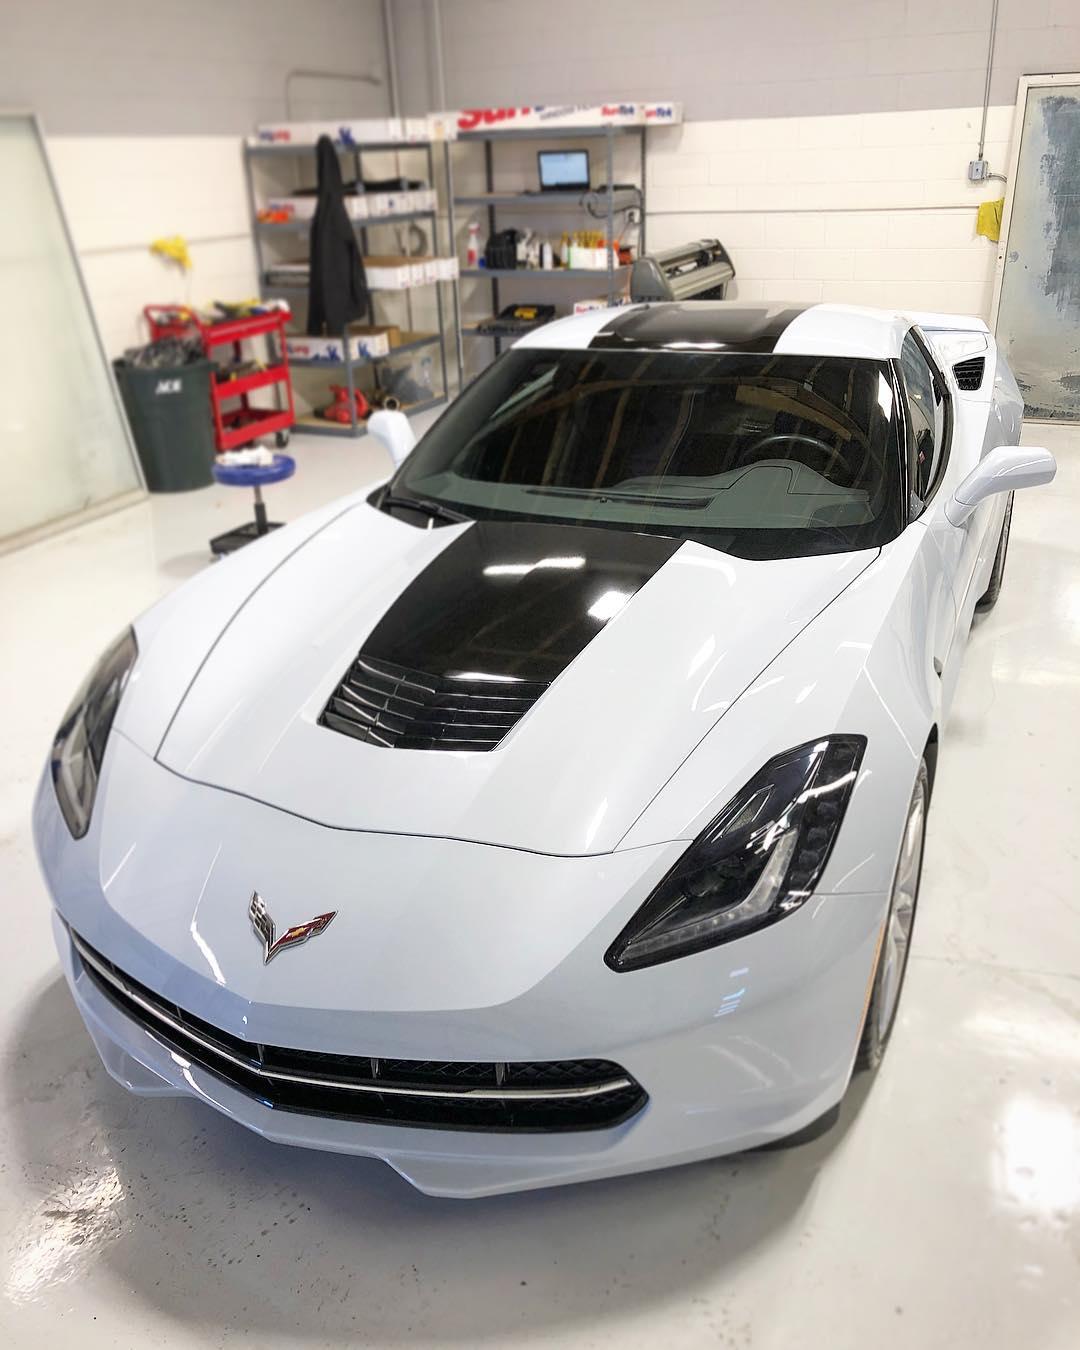 Striped Corvette in Scottsdale